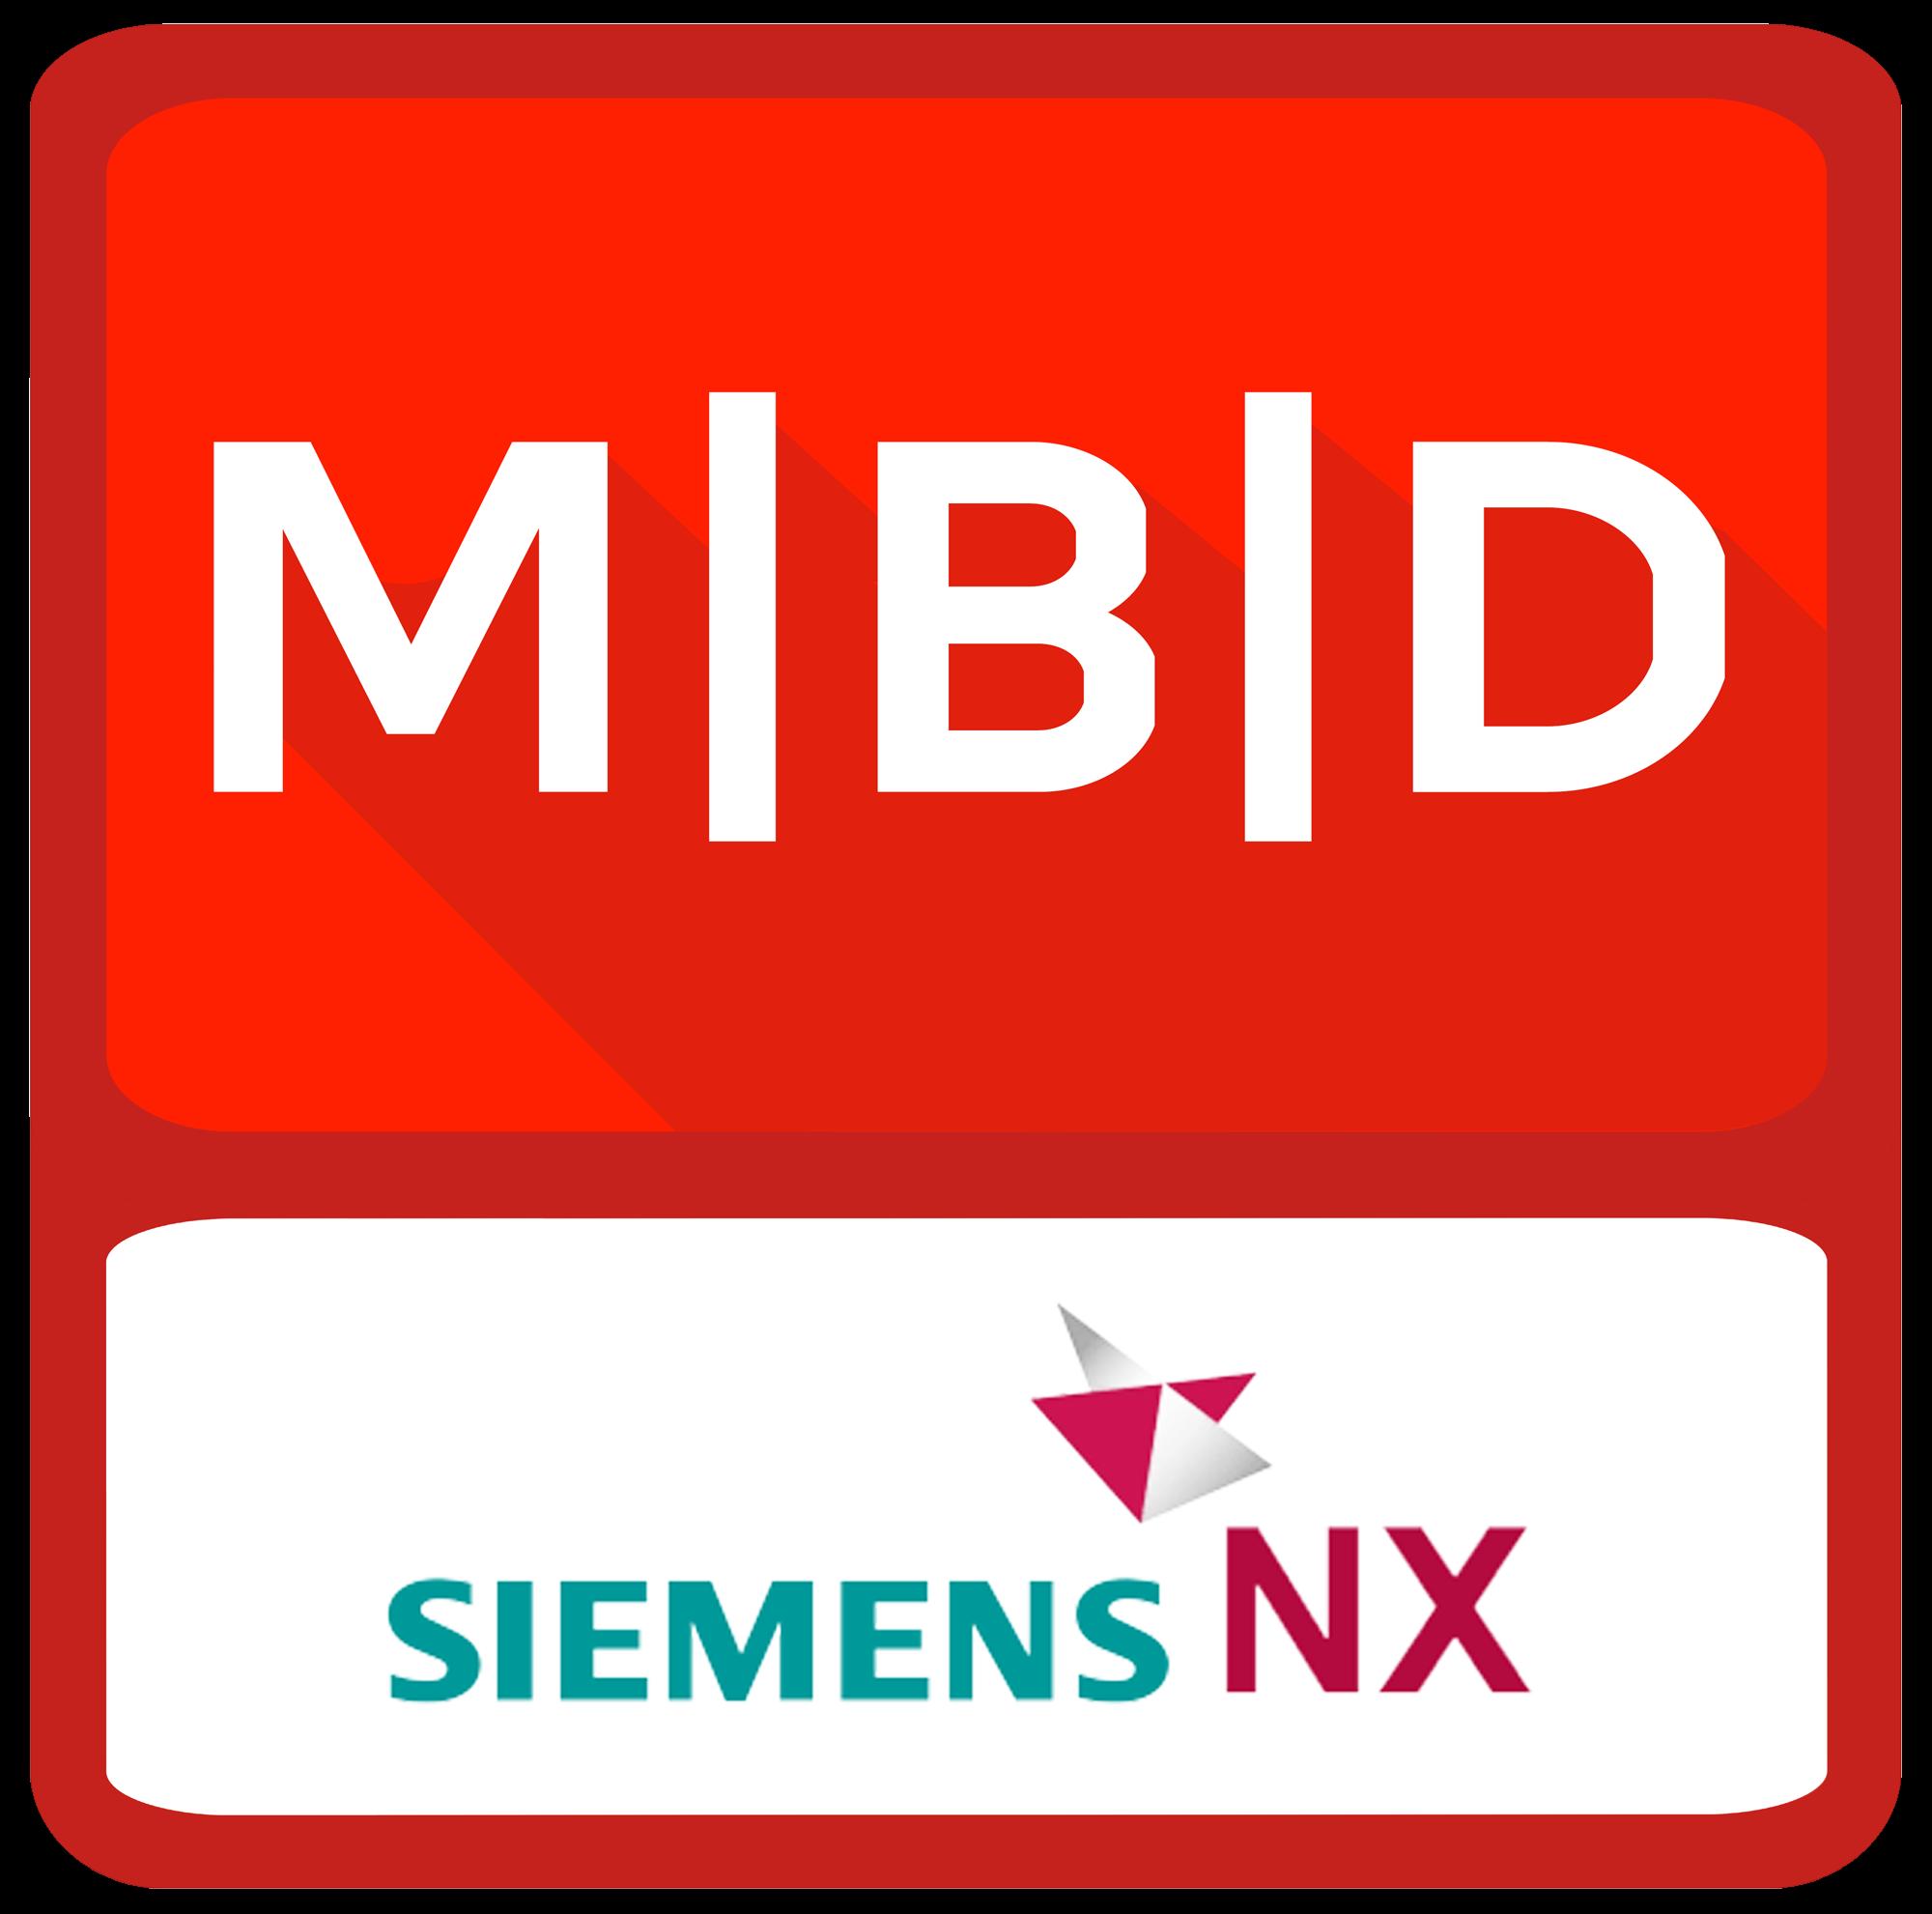 MBDVidia-NX-logo2